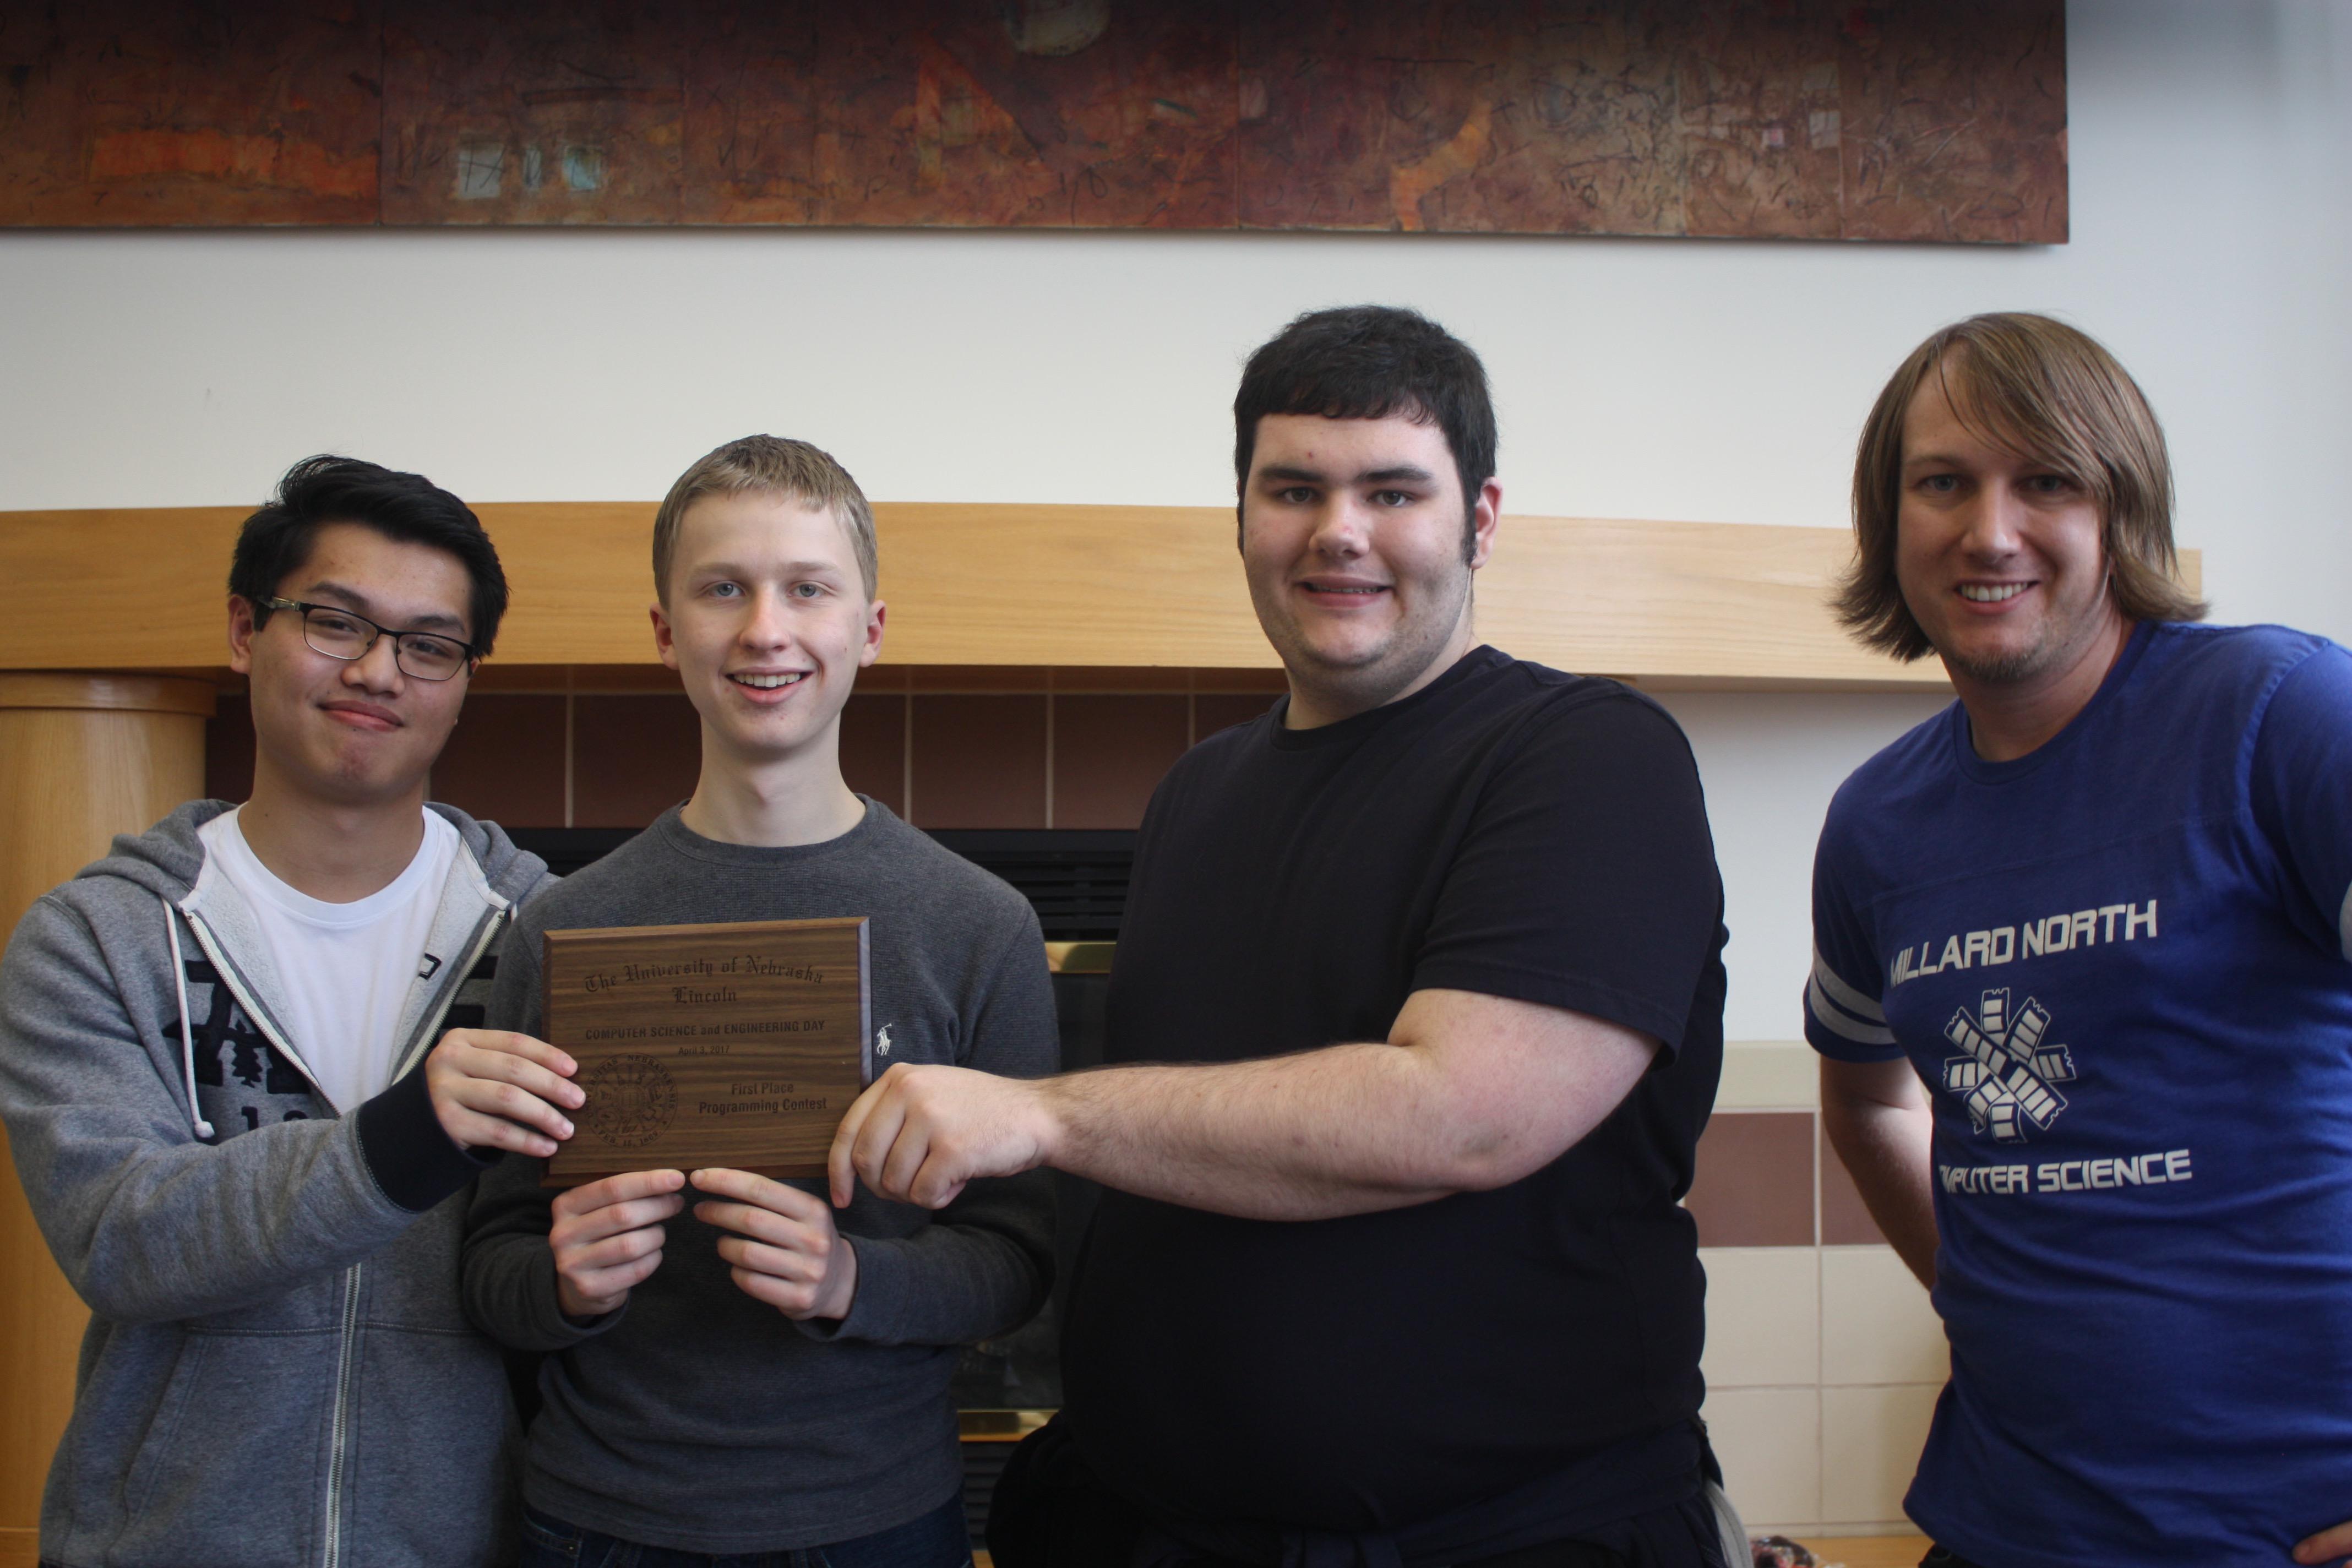 Millard North CSE Day winners Shawn Dong, Zachary Steffek, and Matthew Vavricek with their coach.